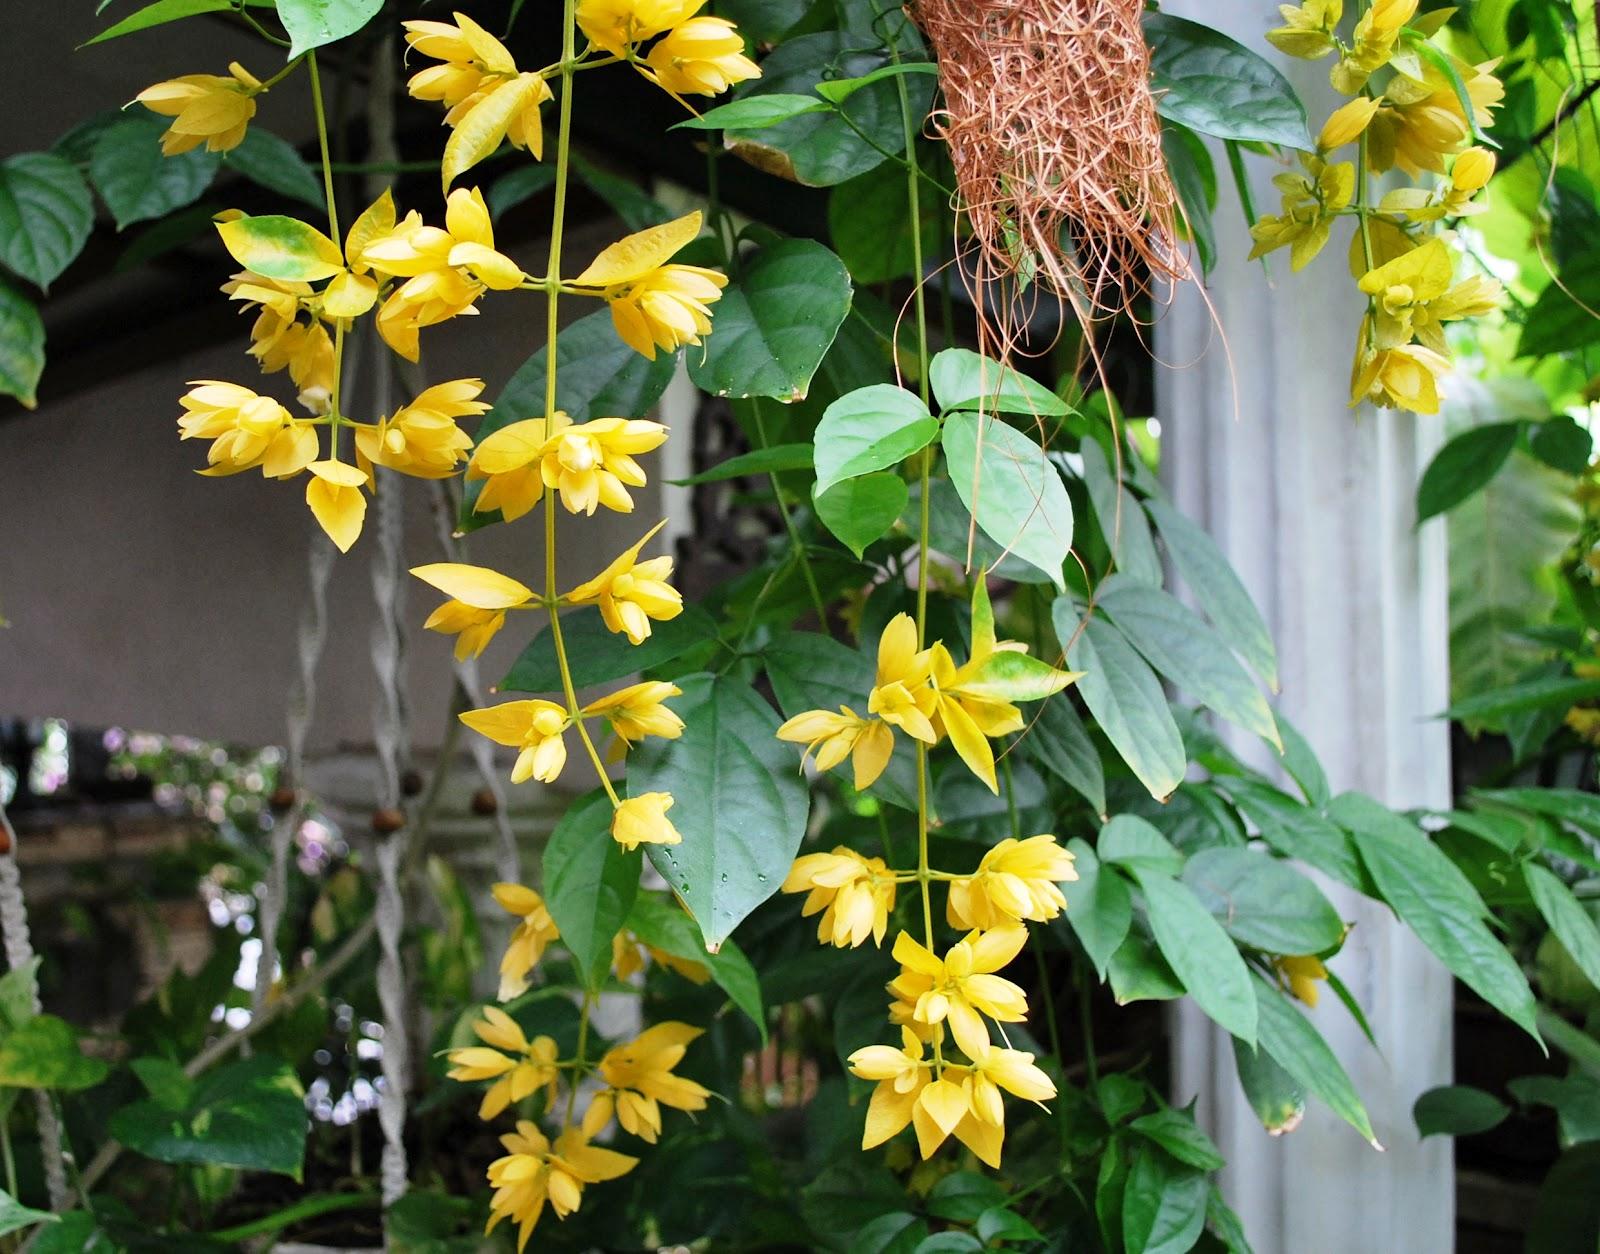 Pak idruss blog the hanging flowers the hanging flowers mightylinksfo